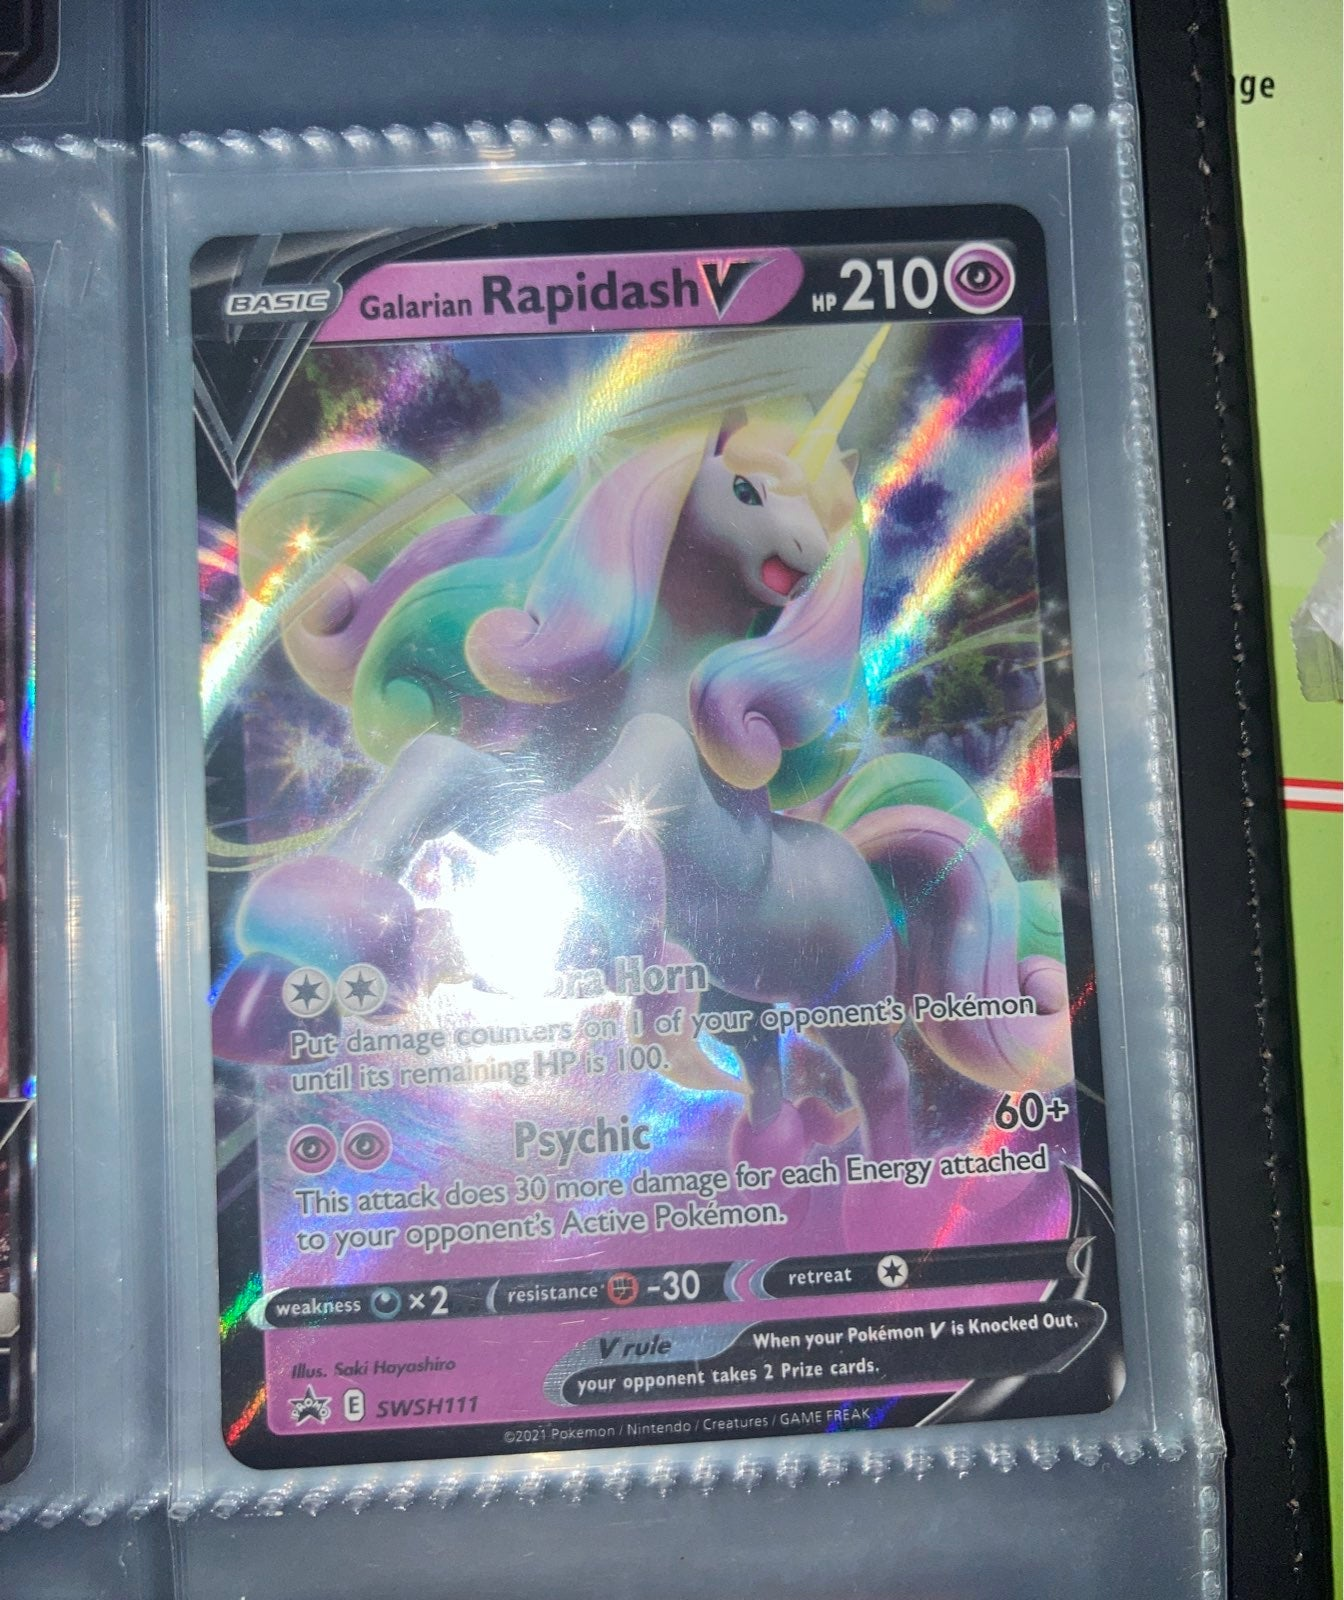 Galarian Rapidash Pokemon Card